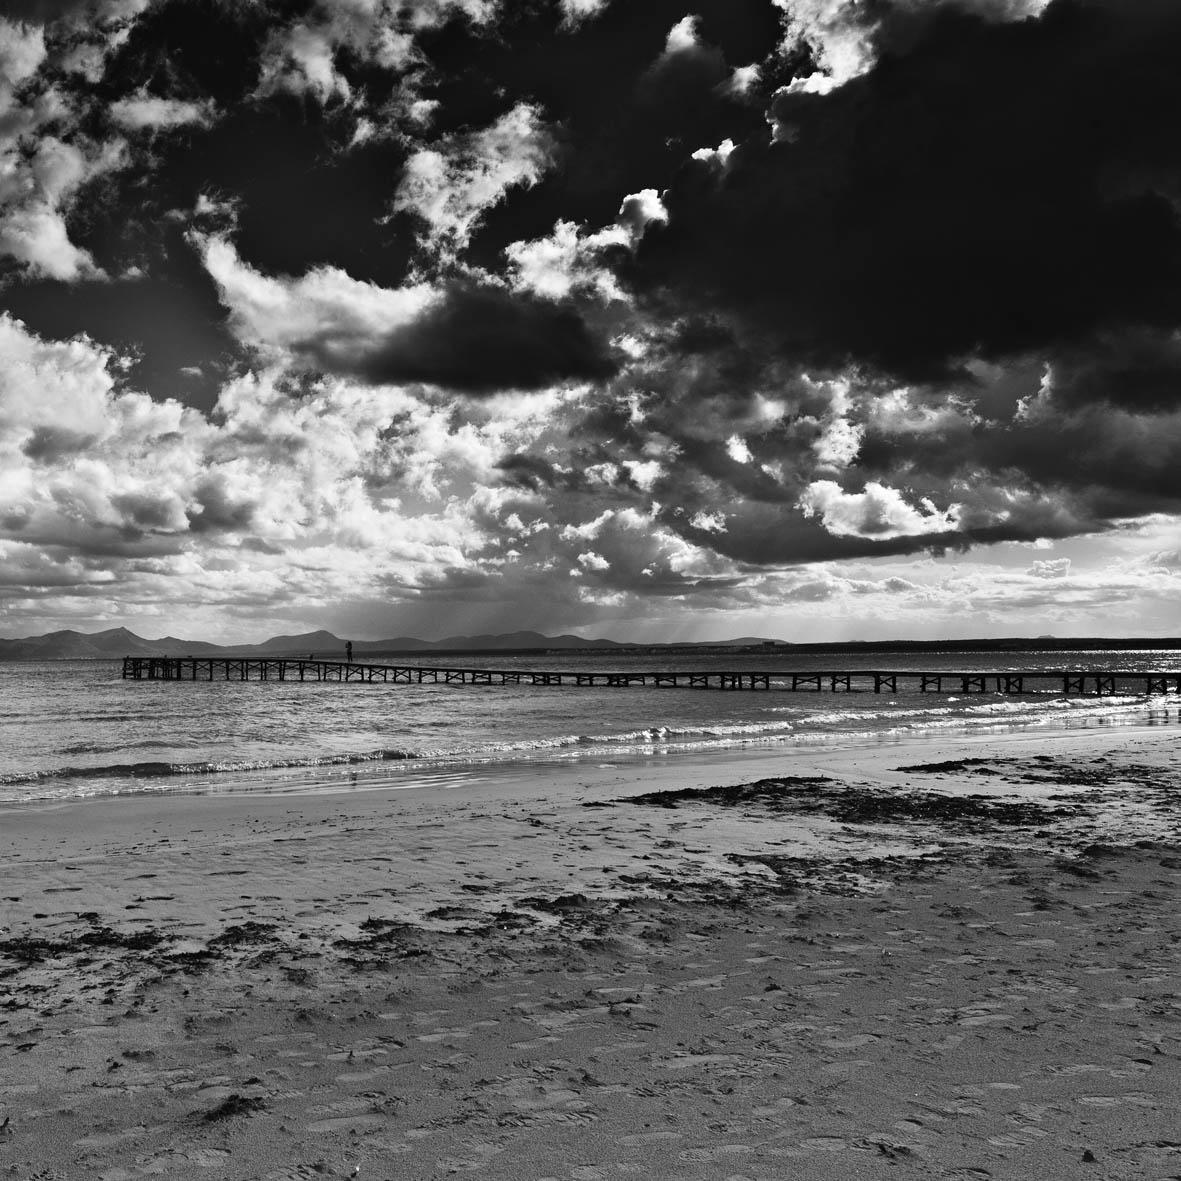 Himmel im quadrat_beach_4